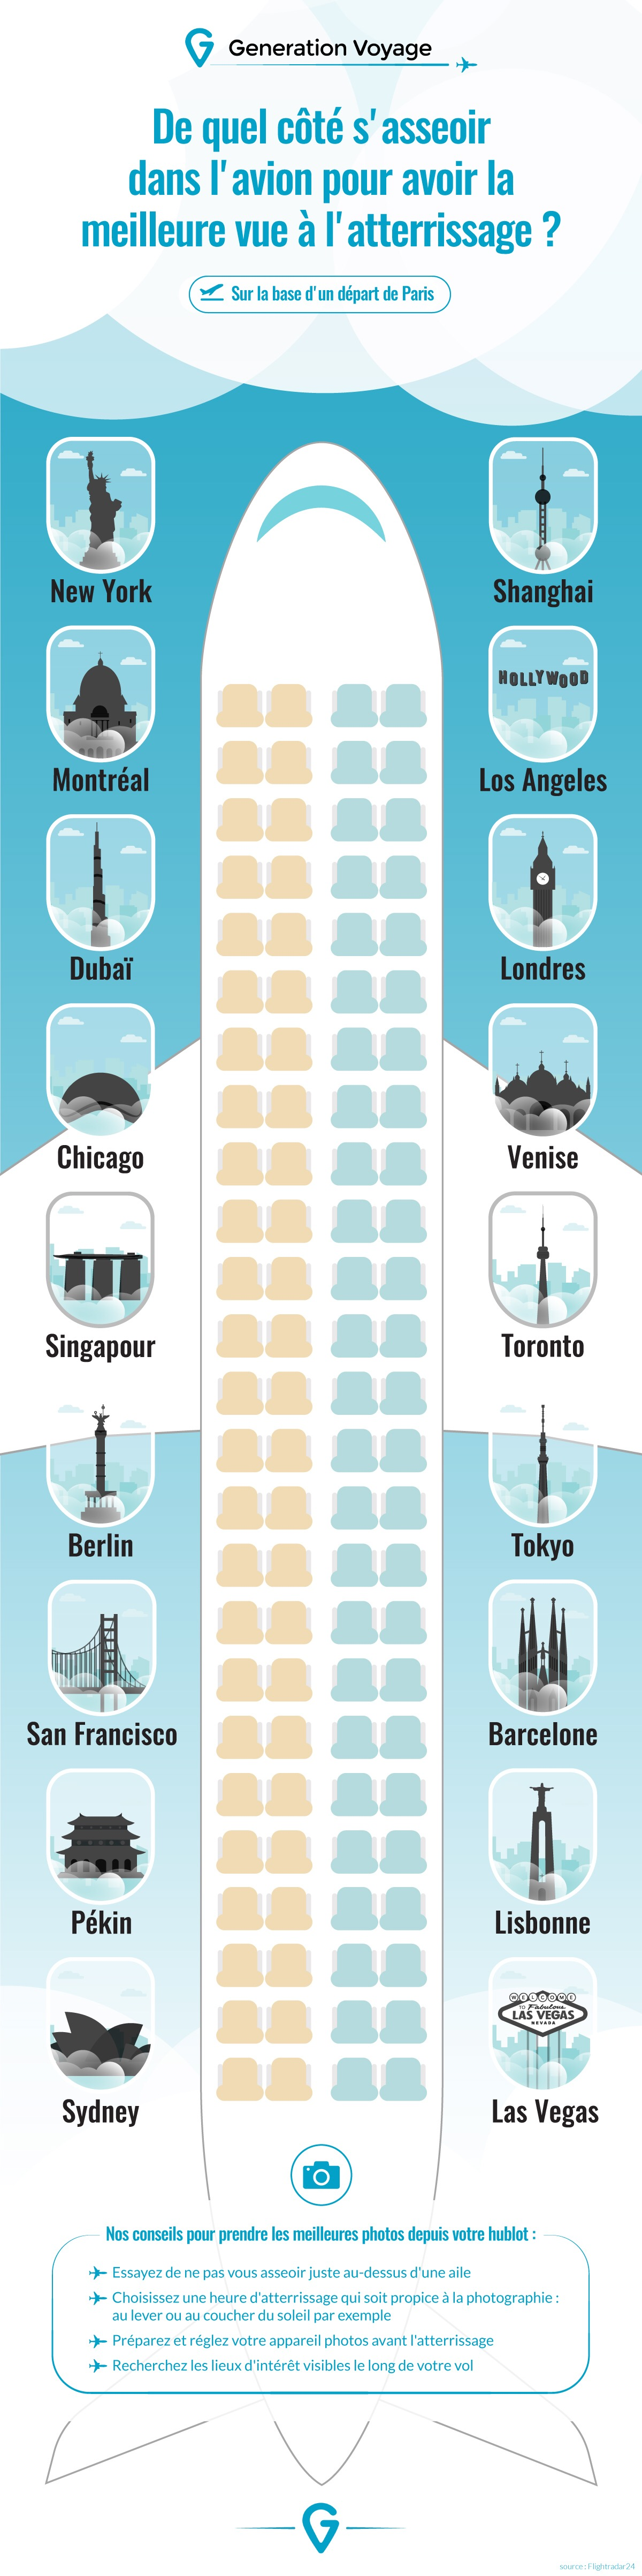 Generation voyage infographie